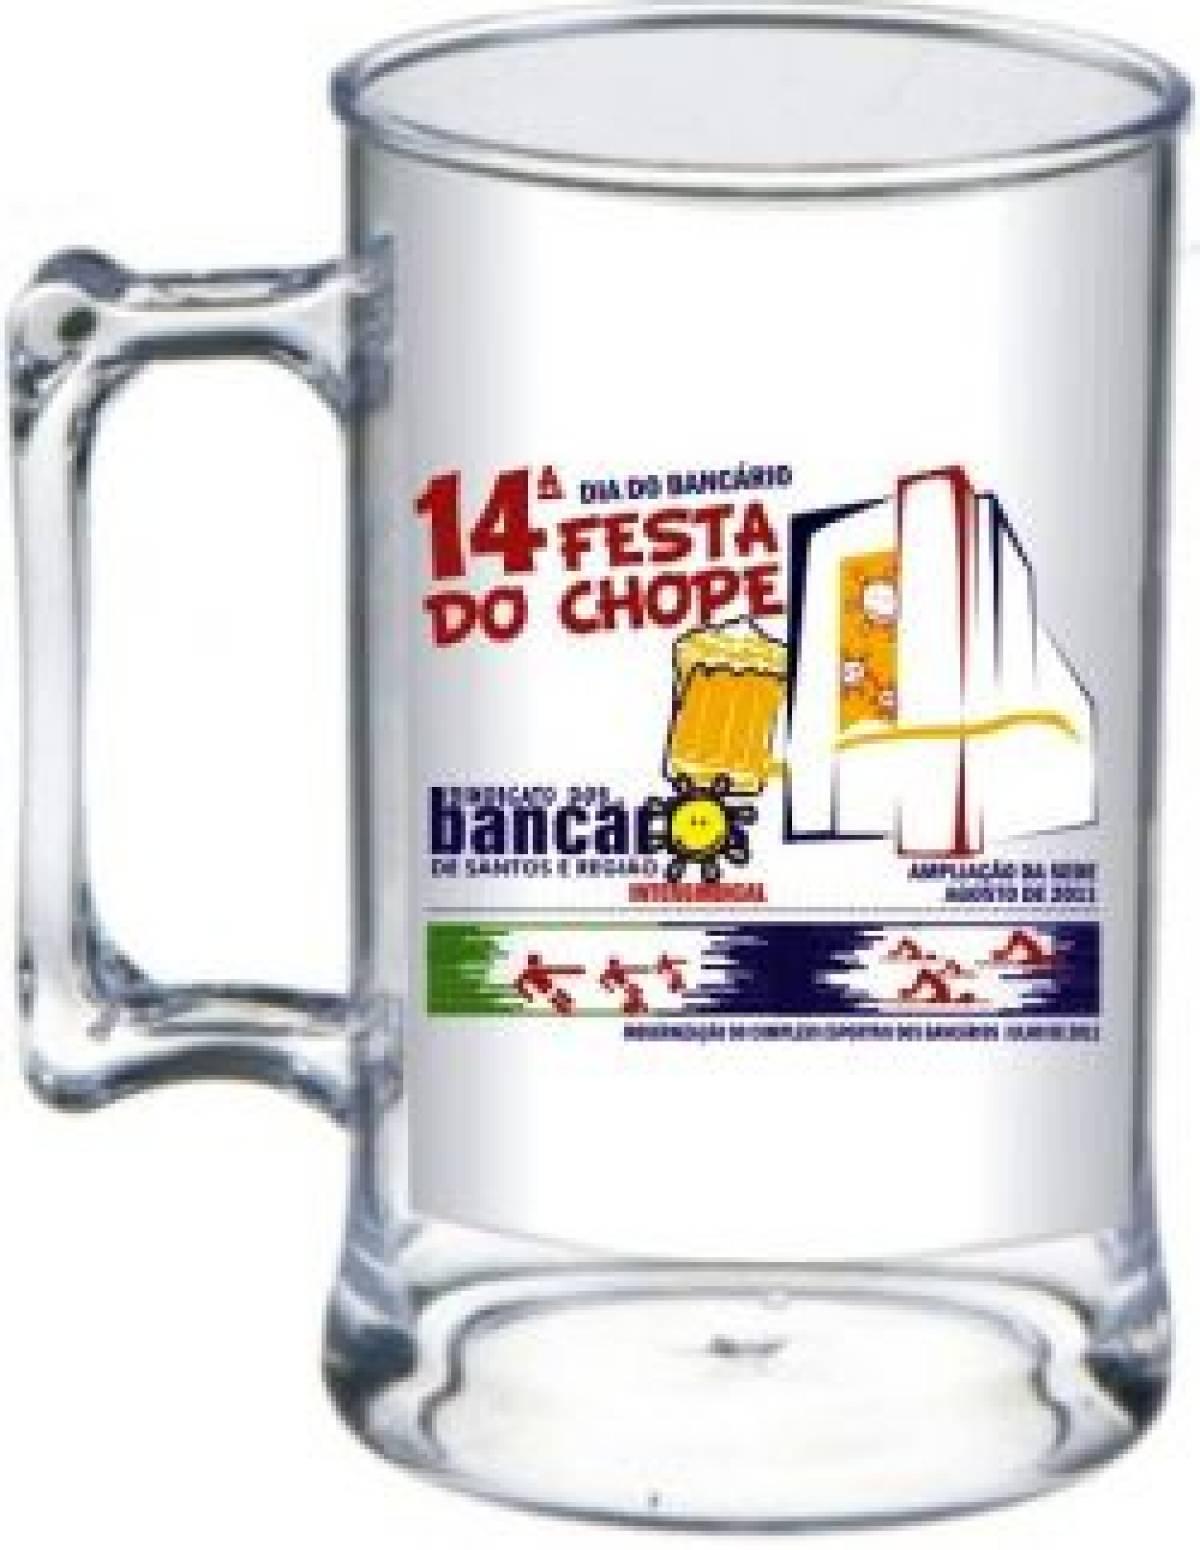 Sexta tem a 14ª Festa do Chope